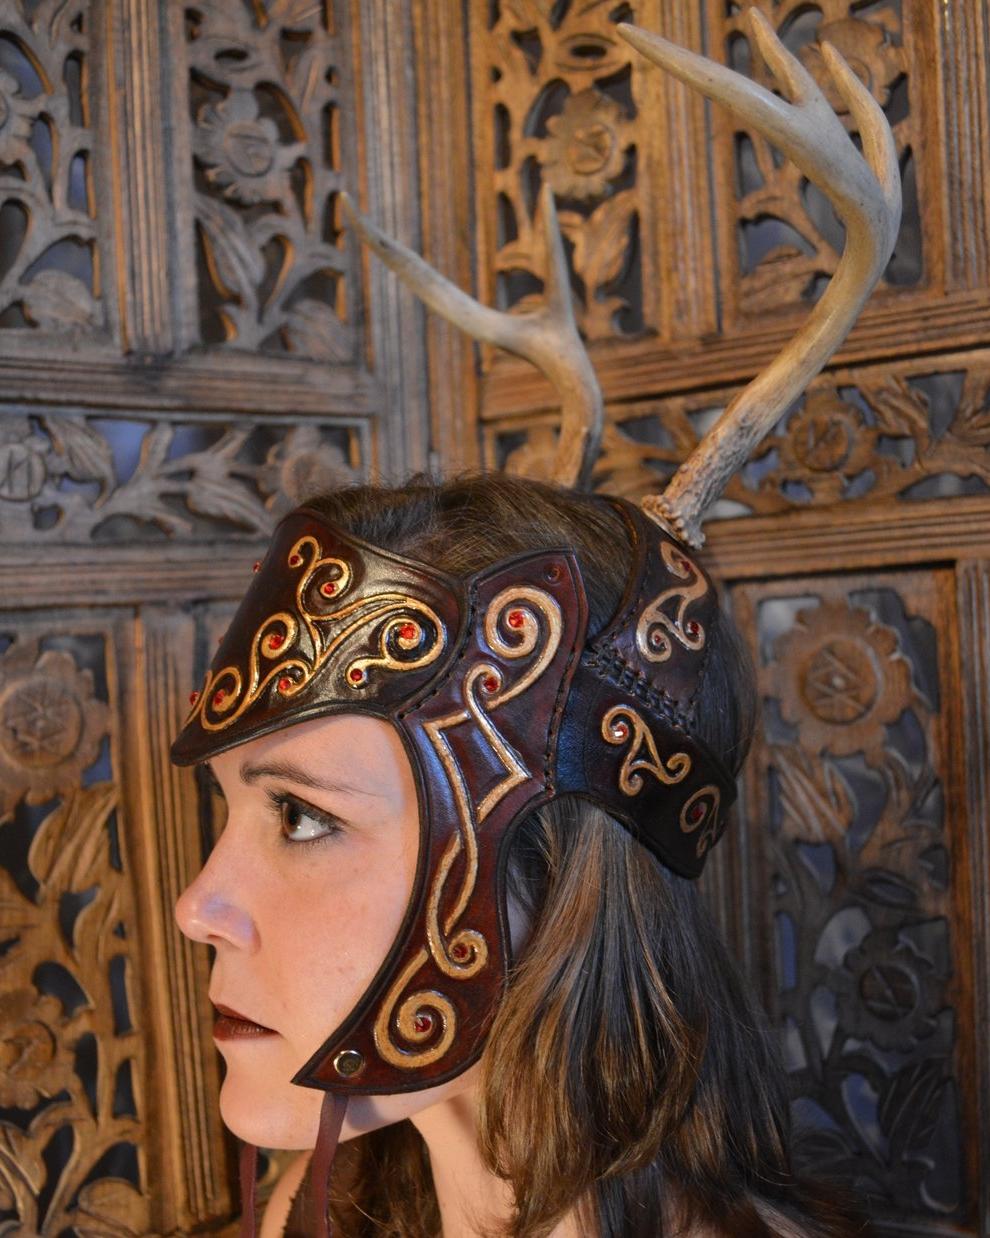 celtic_queen_antler_headdress_by_savagepunkstudio-d6x537y.jpg